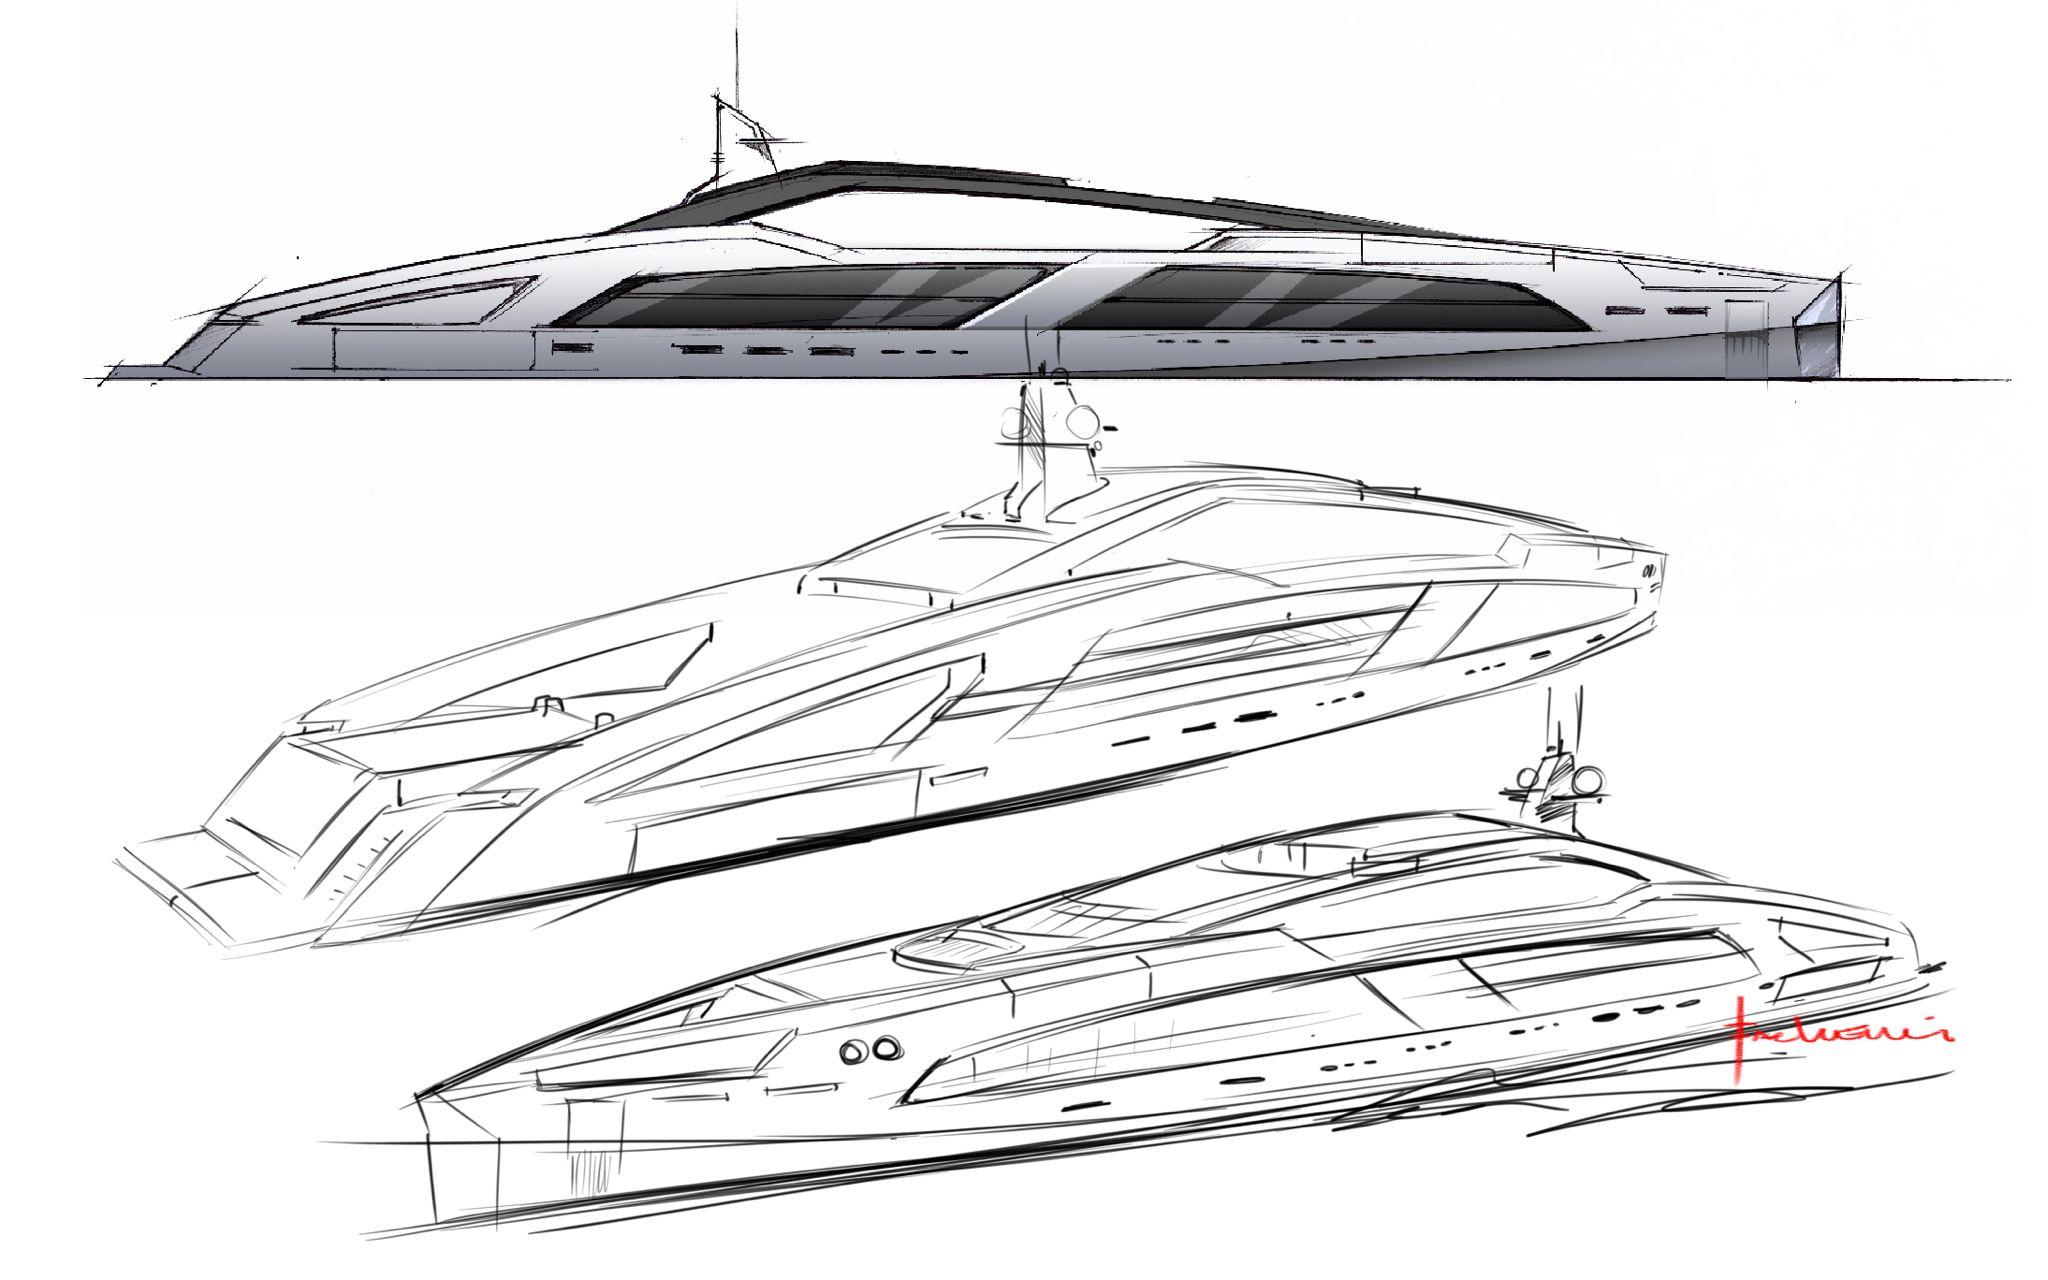 medium resolution of yacht design sketches